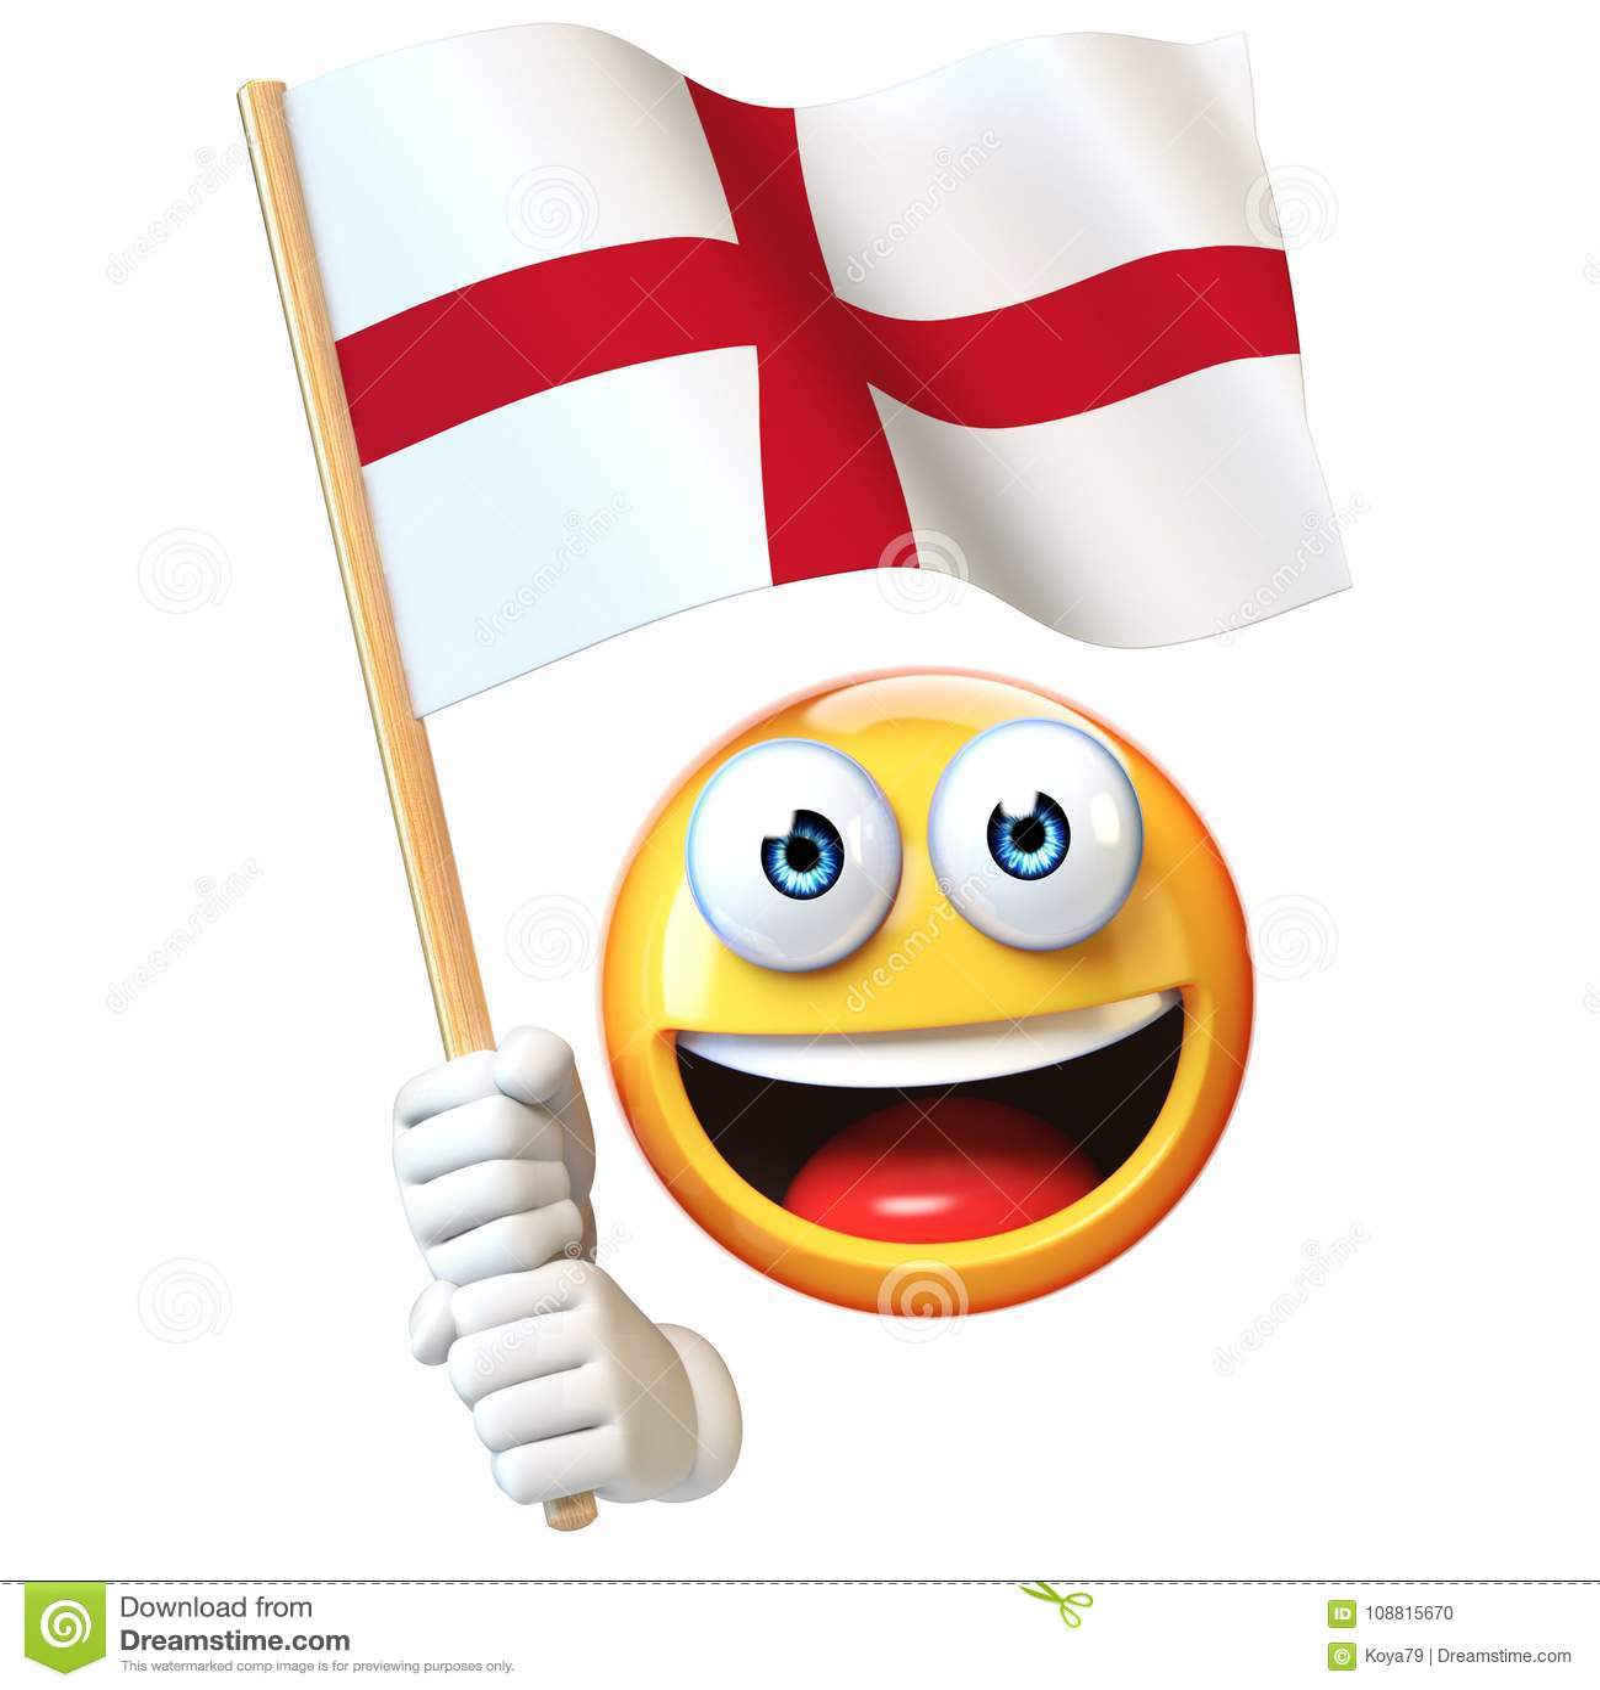 Emoji Holding England Flag Emoticon Waving National Flag Of England